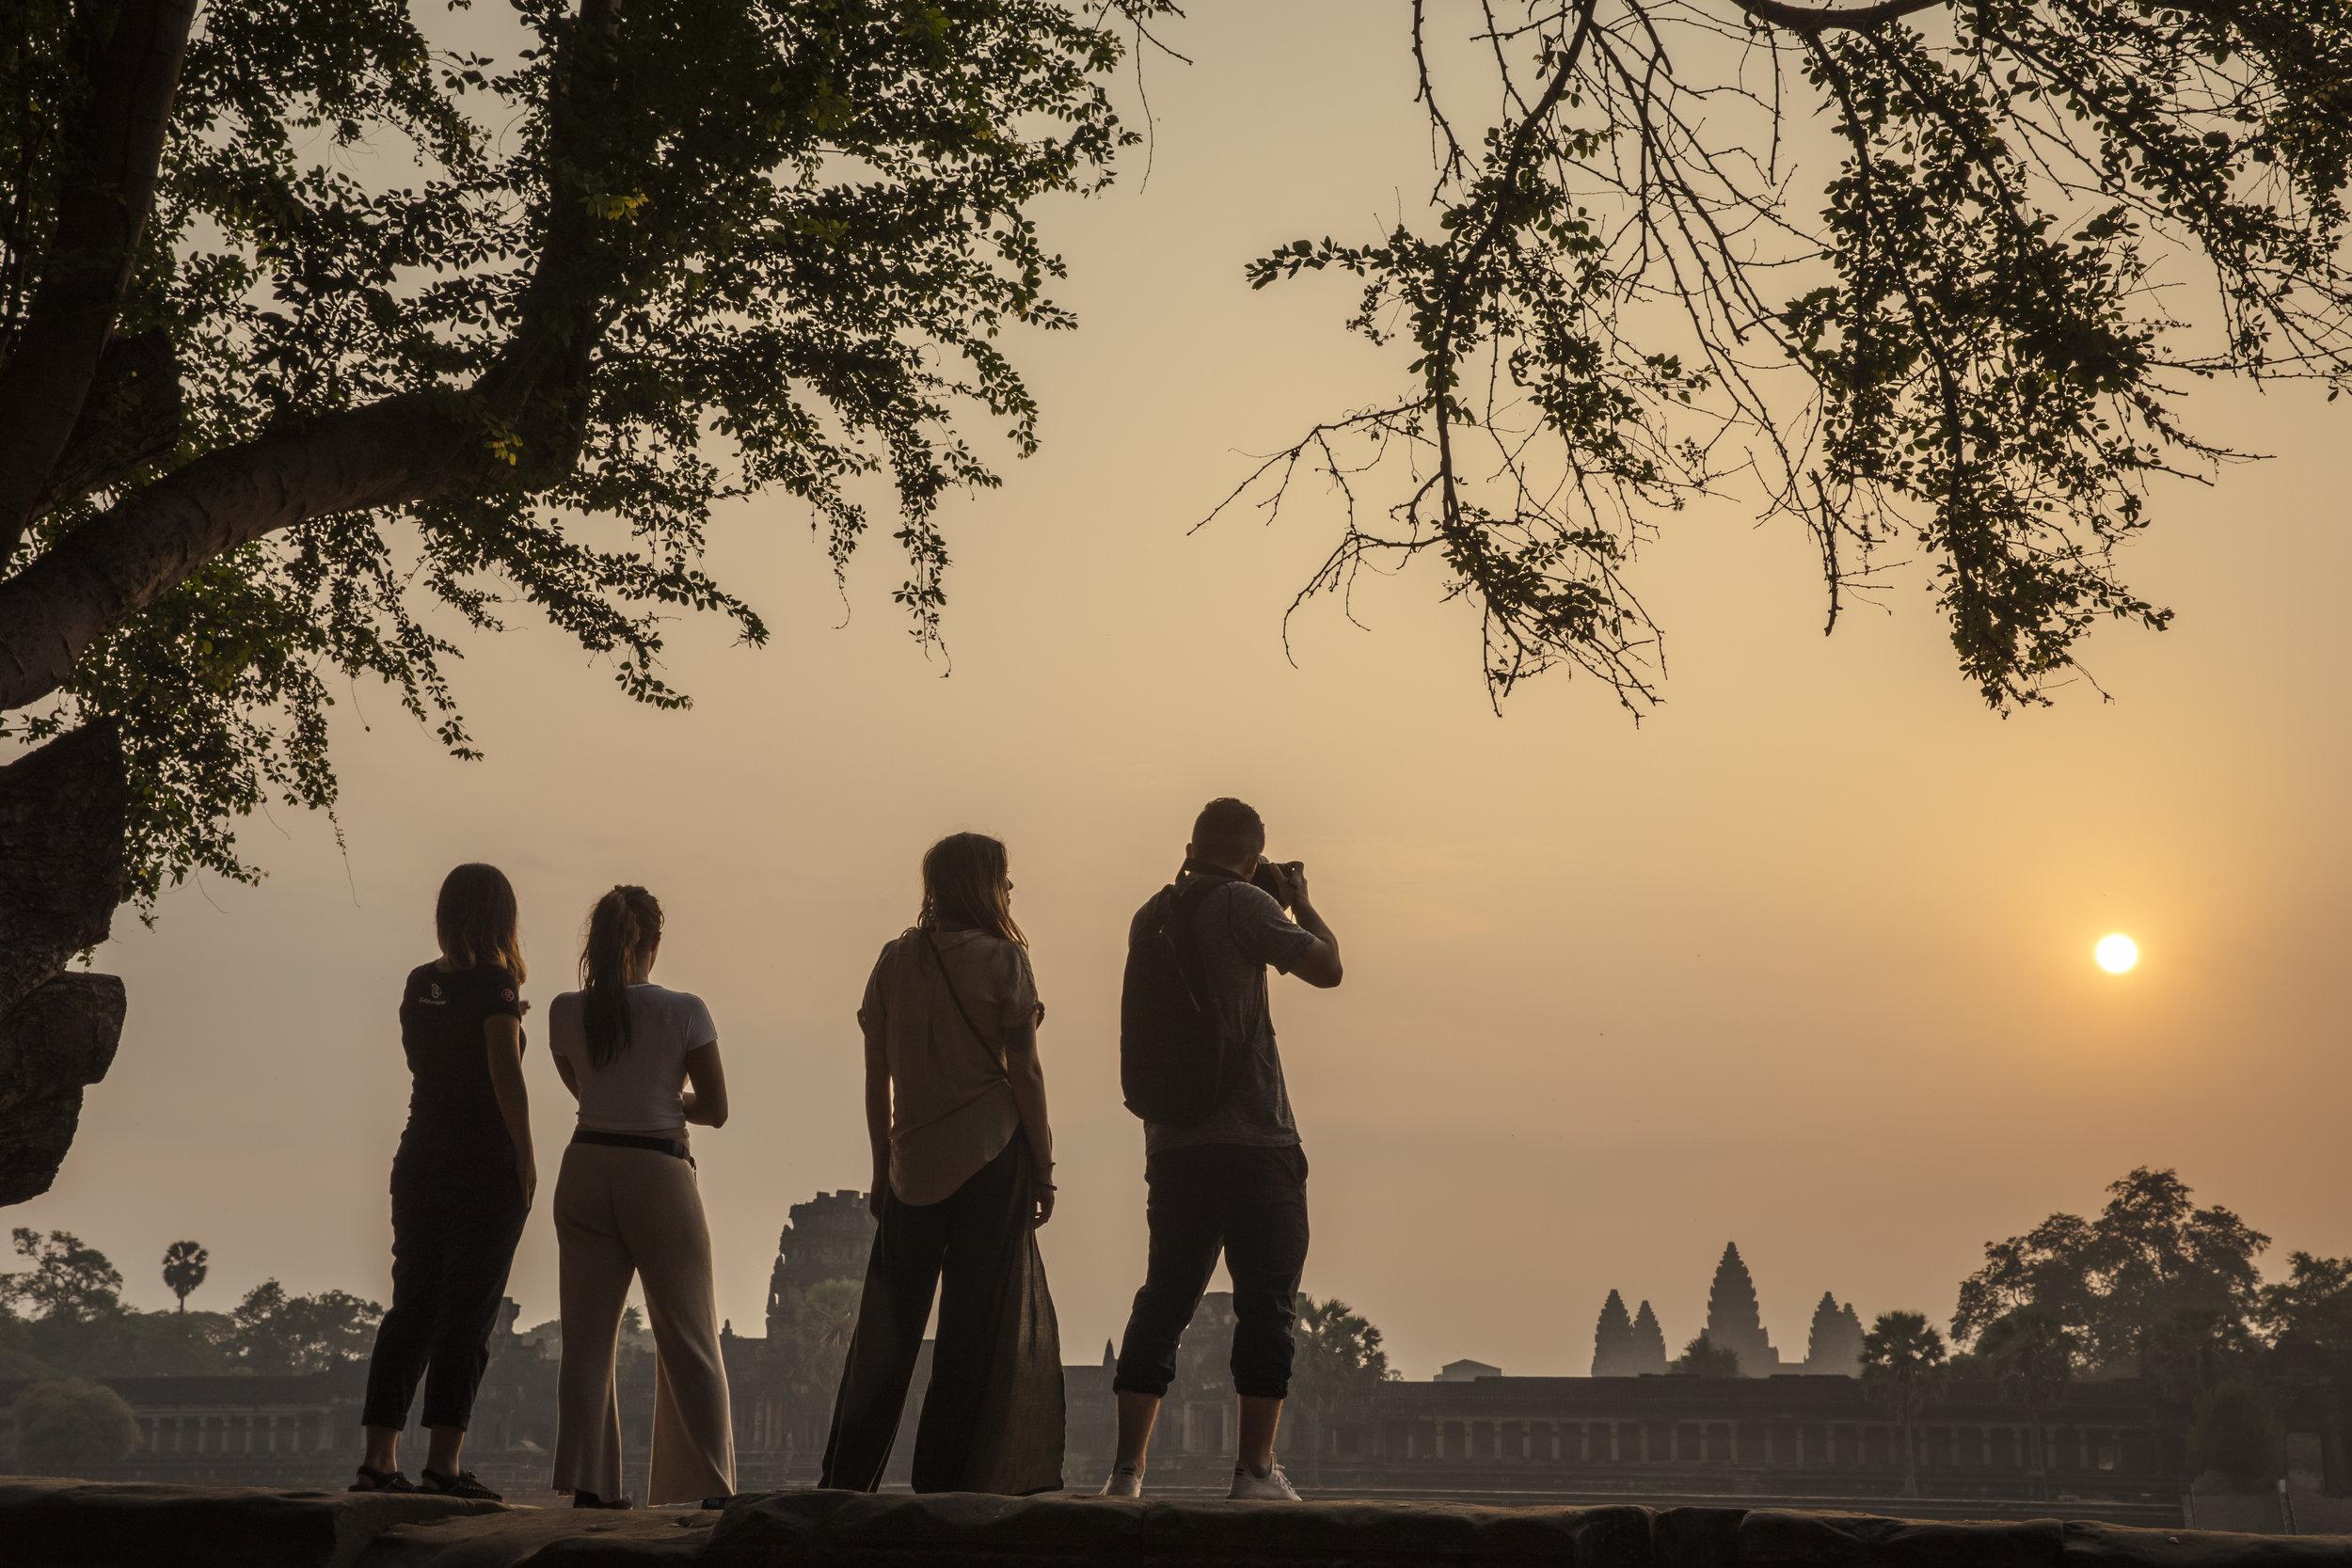 Cambodia Siem Reap Angkor Wat Sunrise Travellers CEO Taking Photo - Oana Dragan 2019 _T4A0562 Lg RGB.jpg